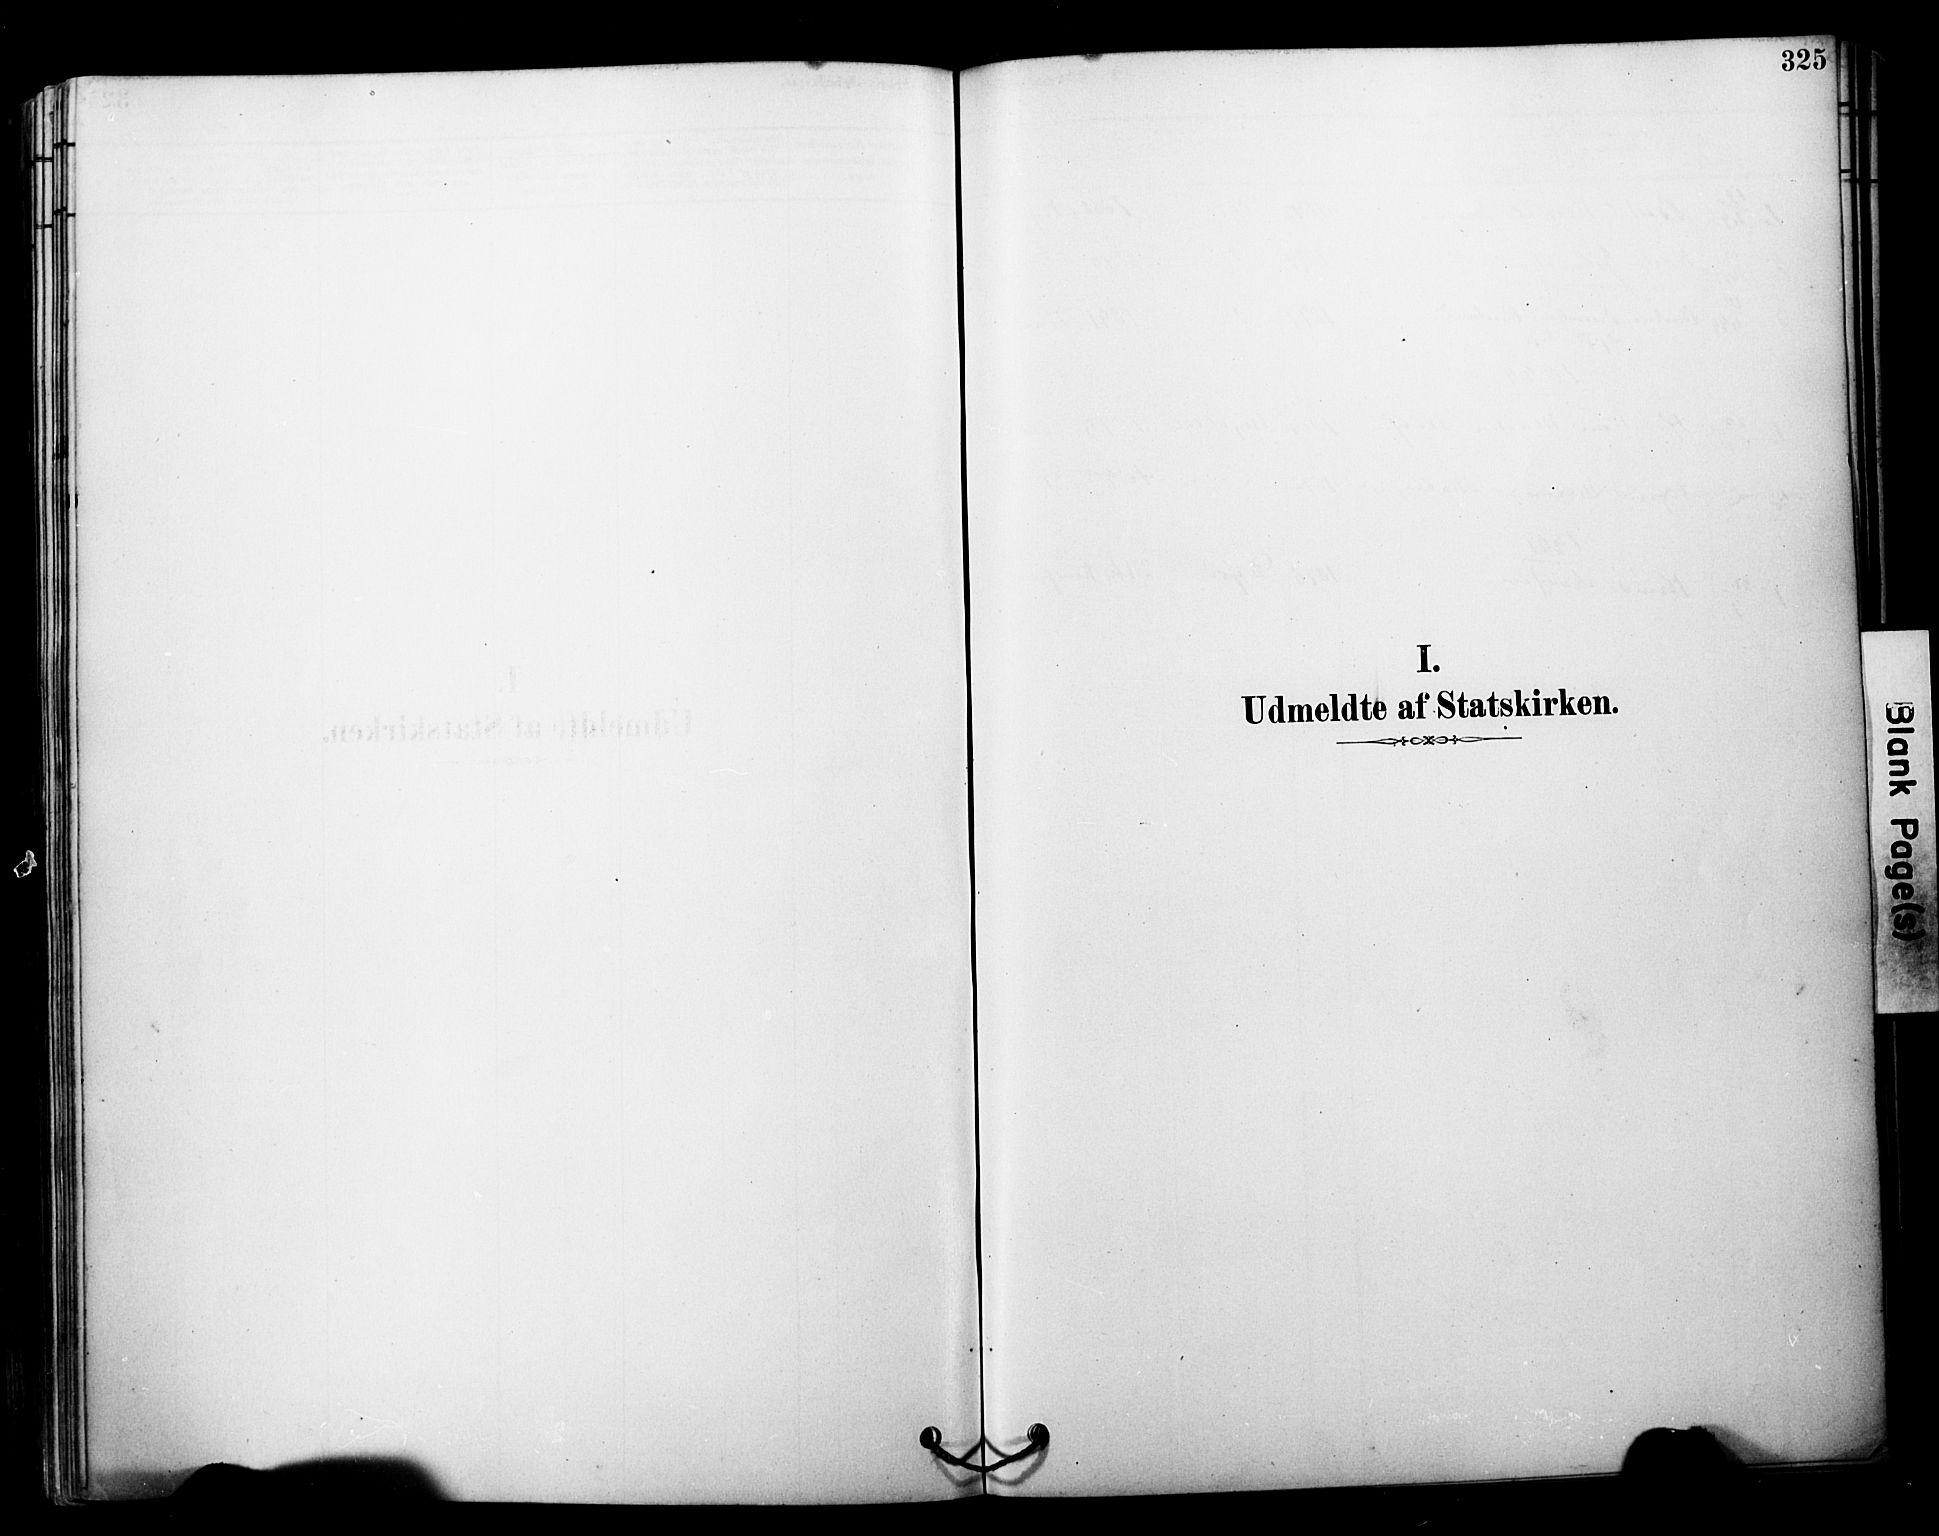 SATØ, Tranøy sokneprestkontor, I/Ia/Iaa/L0011kirke: Ministerialbok nr. 11, 1878-1904, s. 325